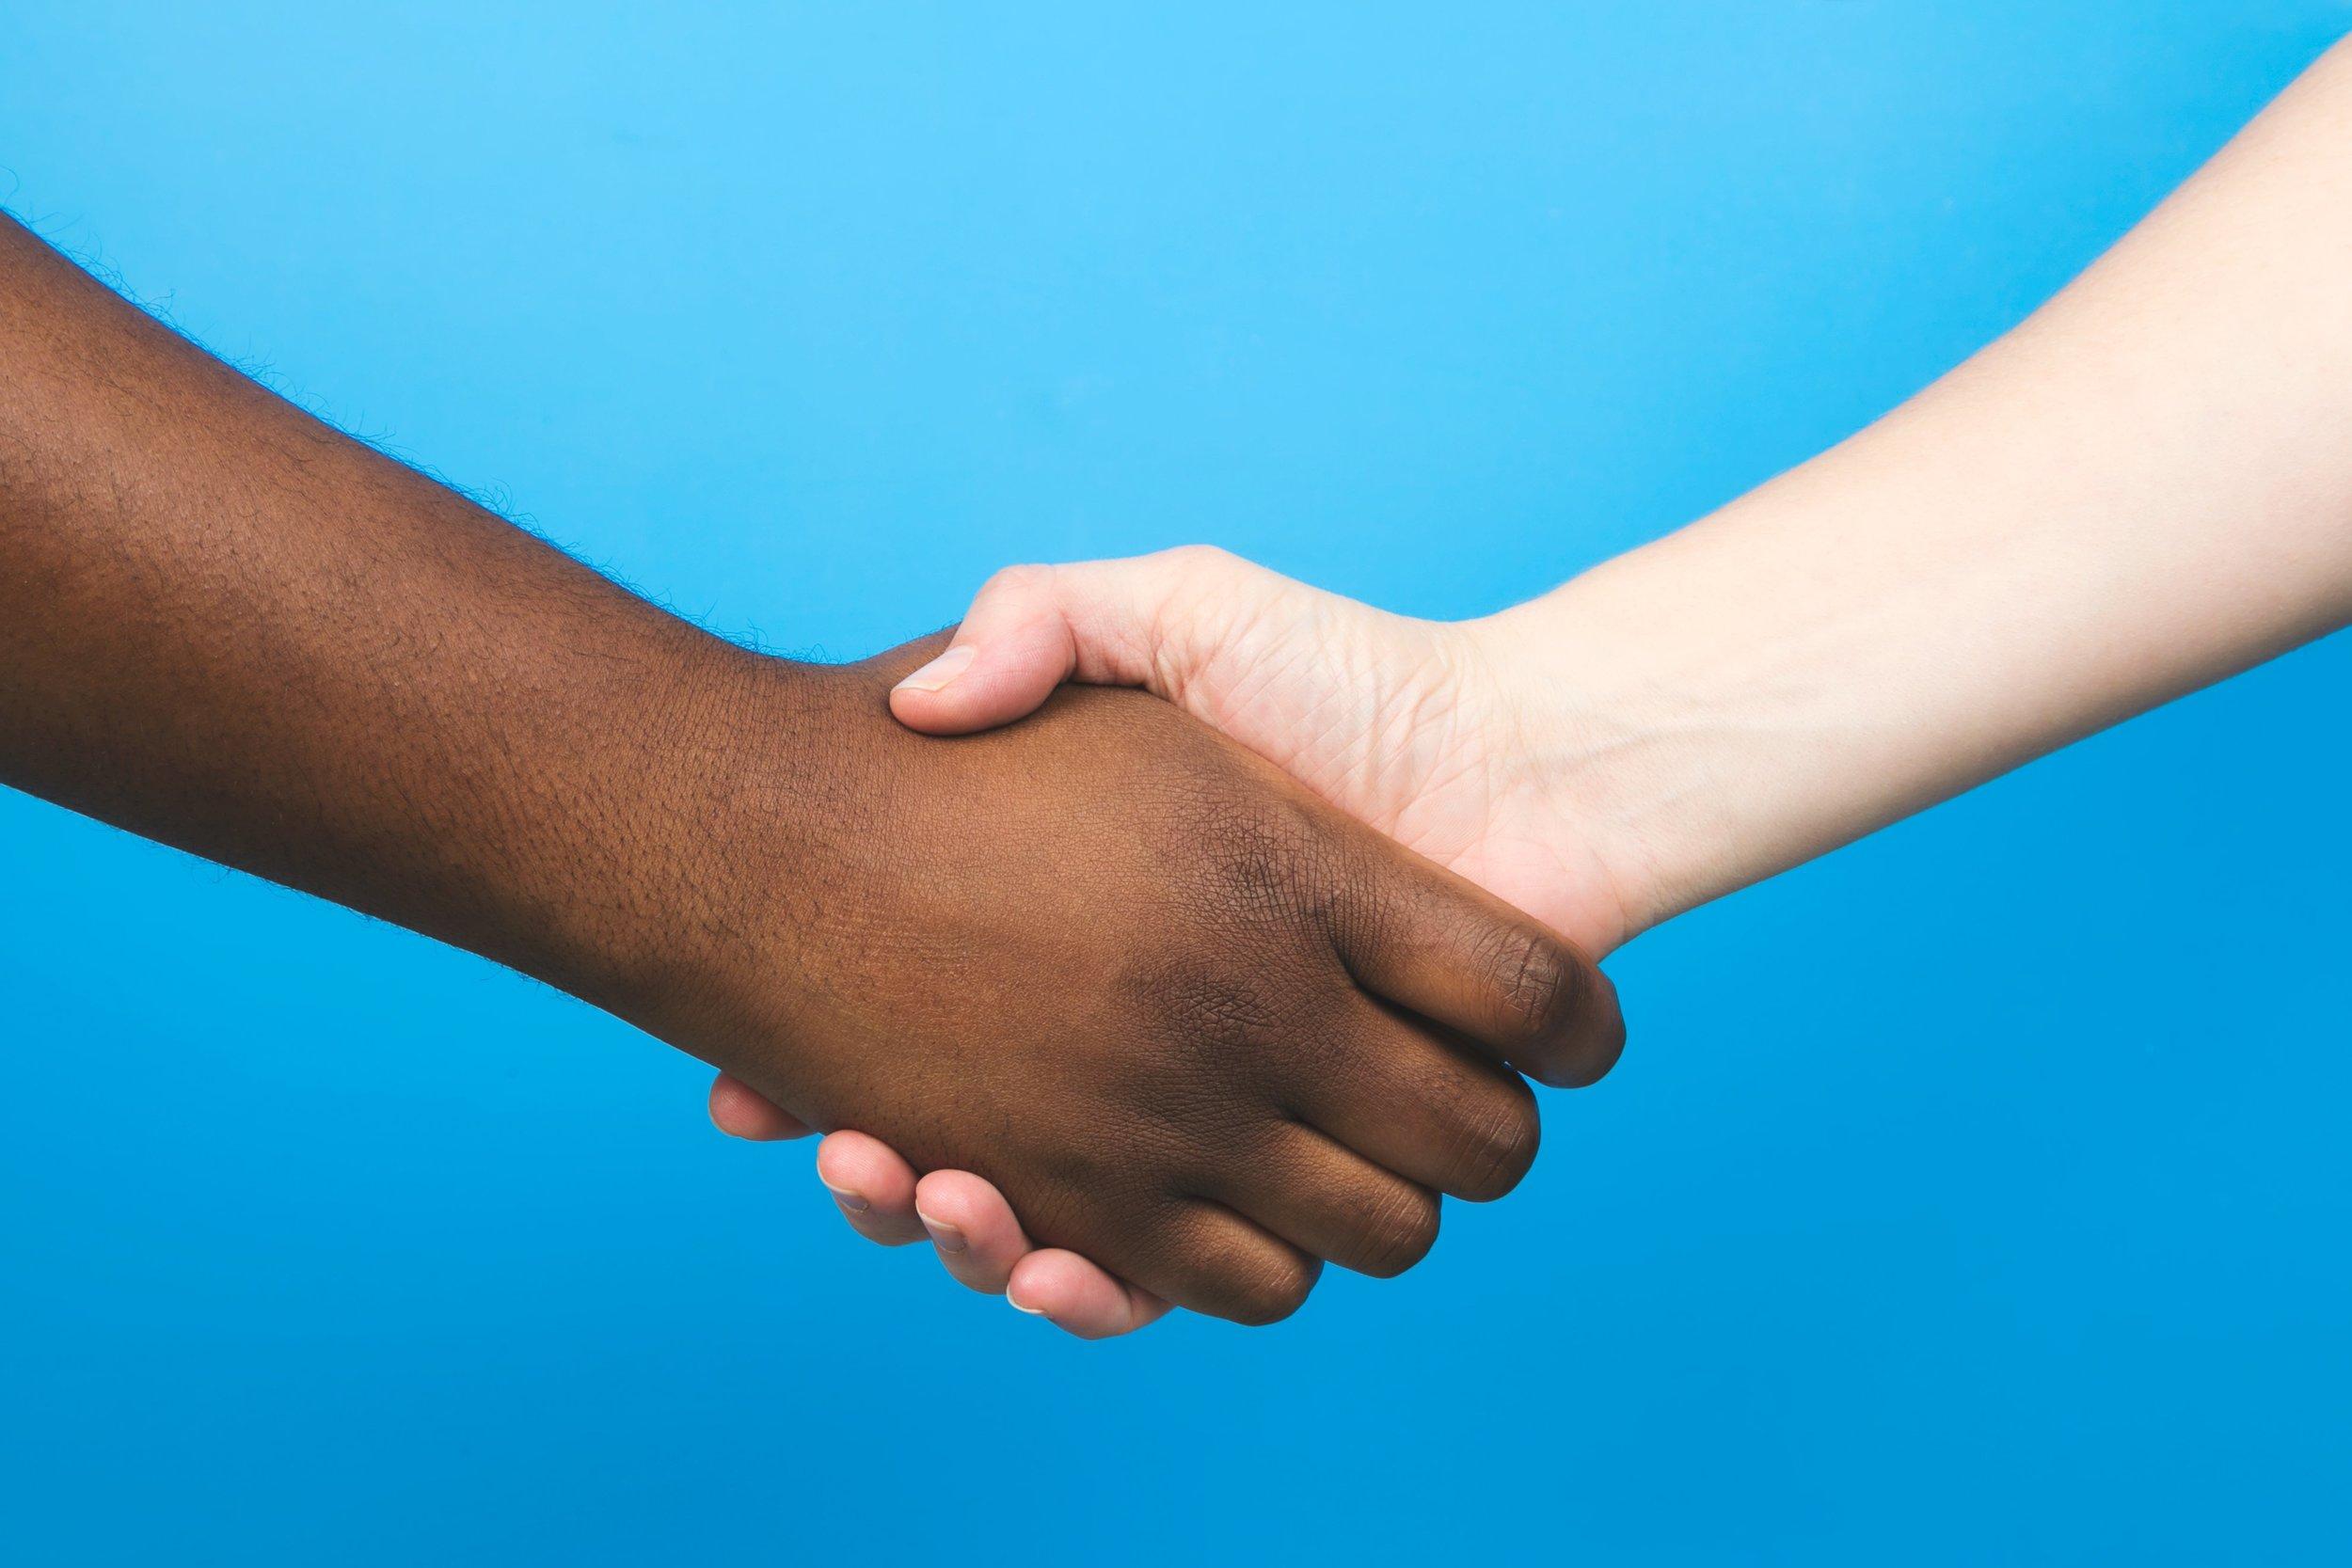 handshake-on-blue.jpg